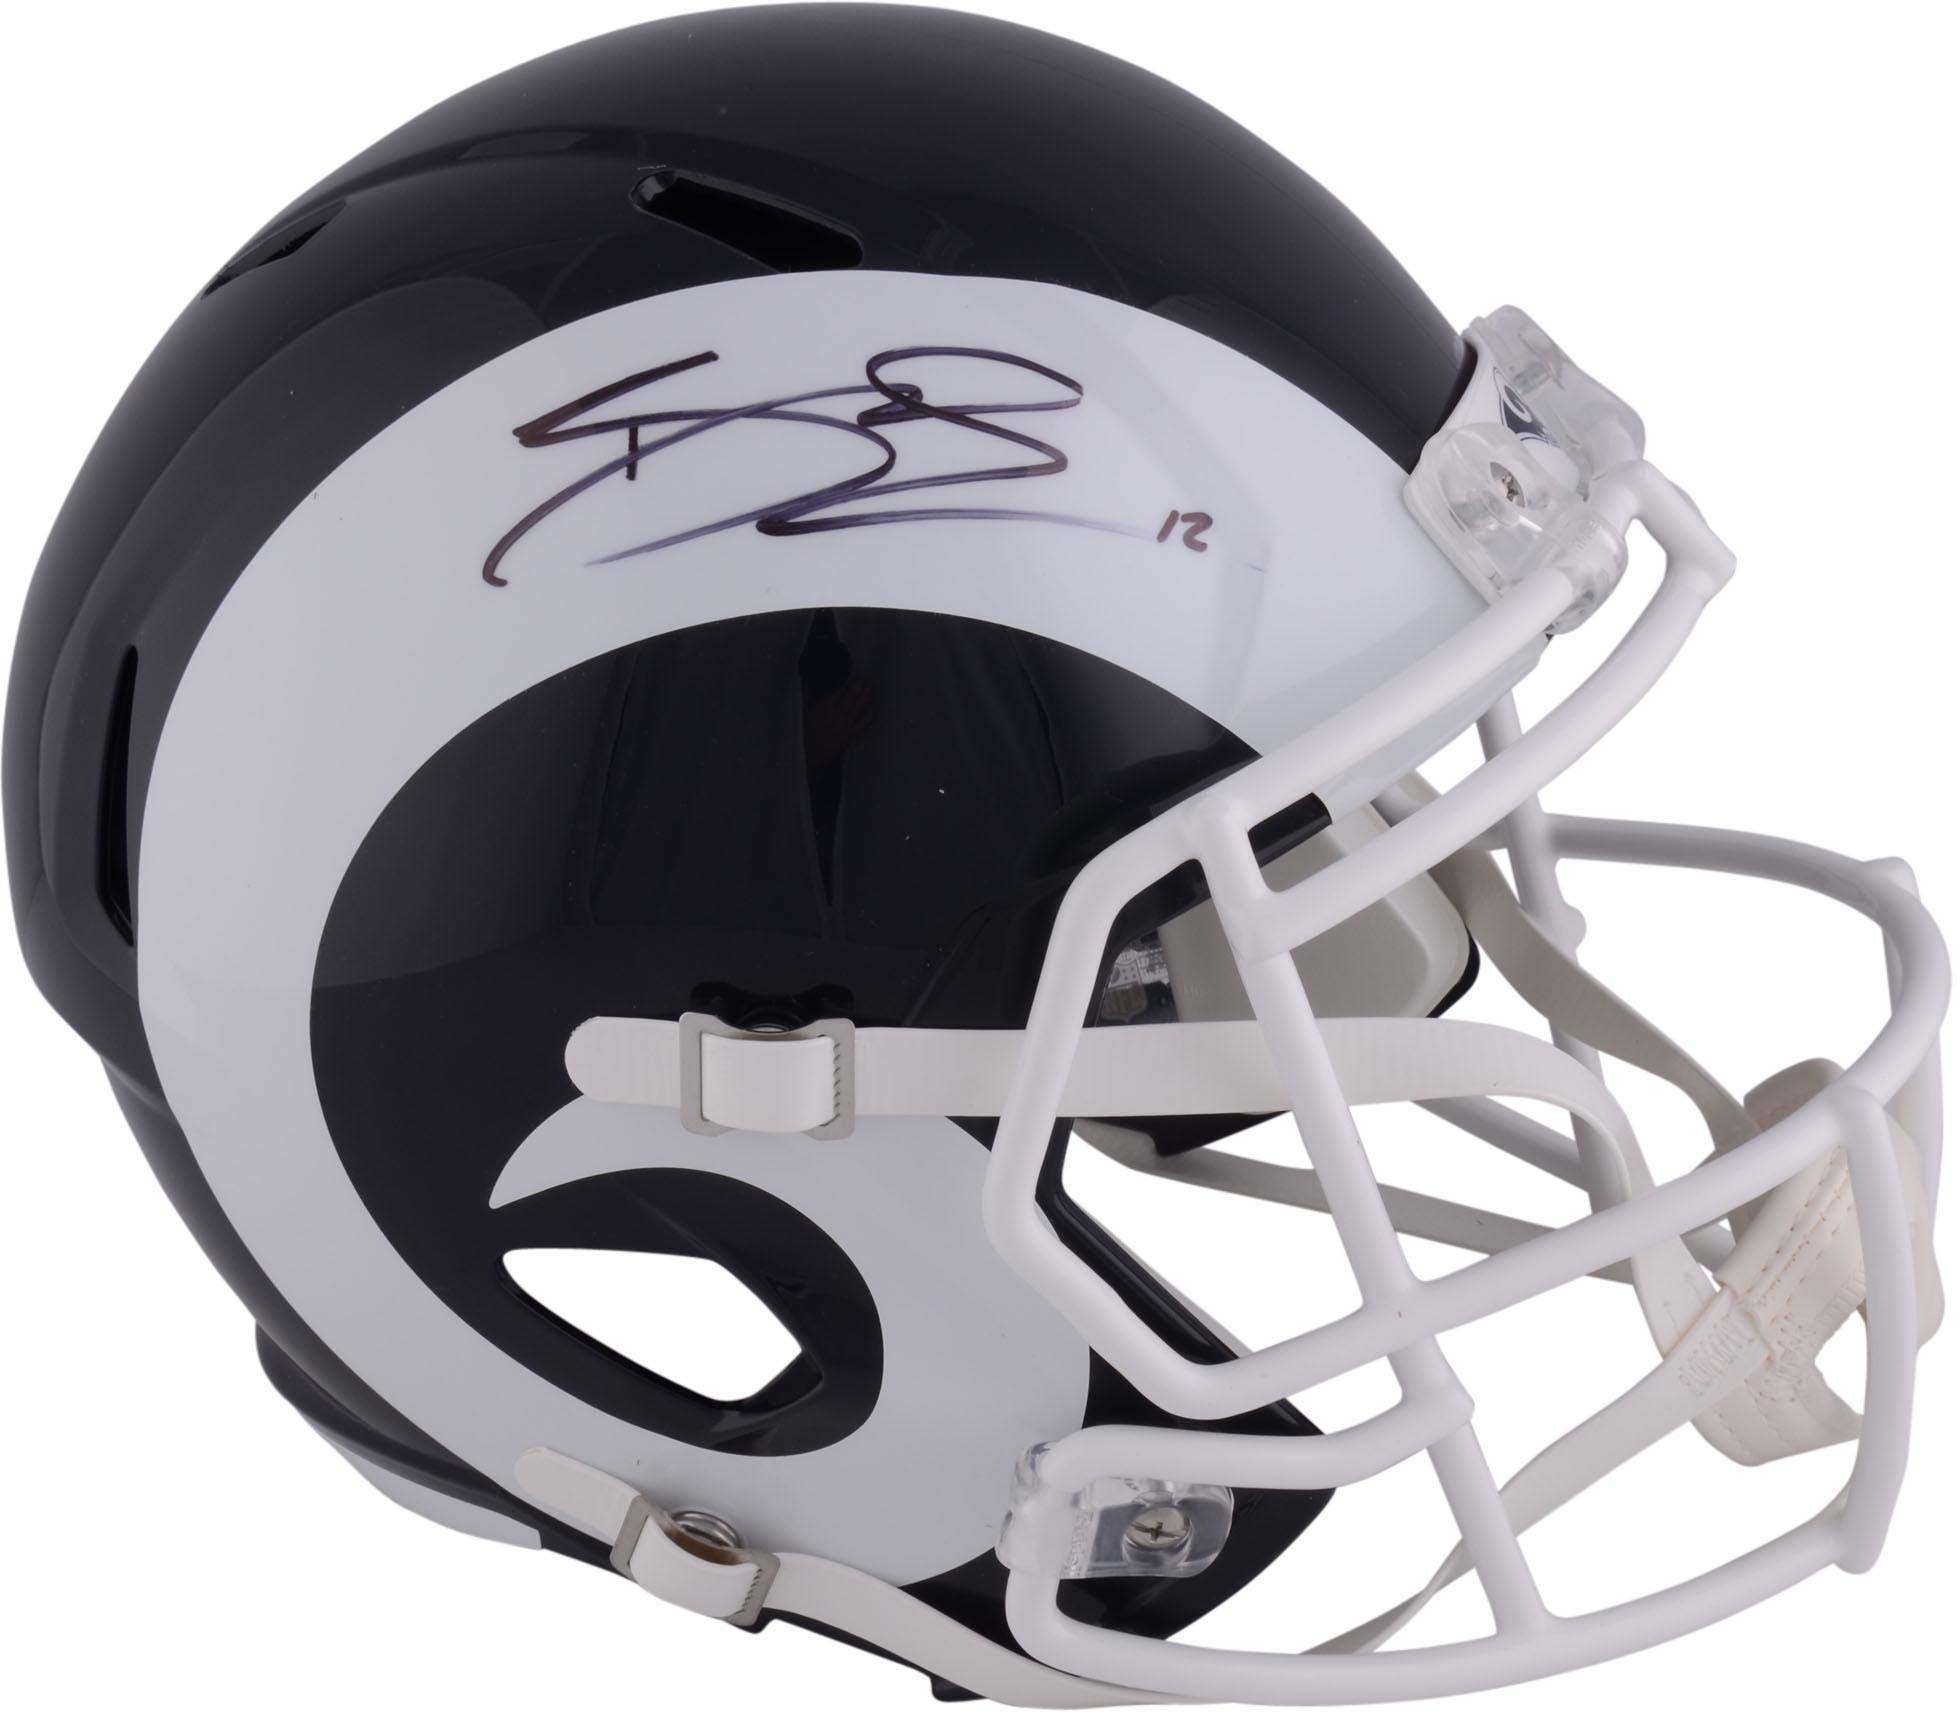 Brandin Cooks Los Angeles Rams Autographed Riddell Speed Replica Helmet Fanatics Authentic Certified